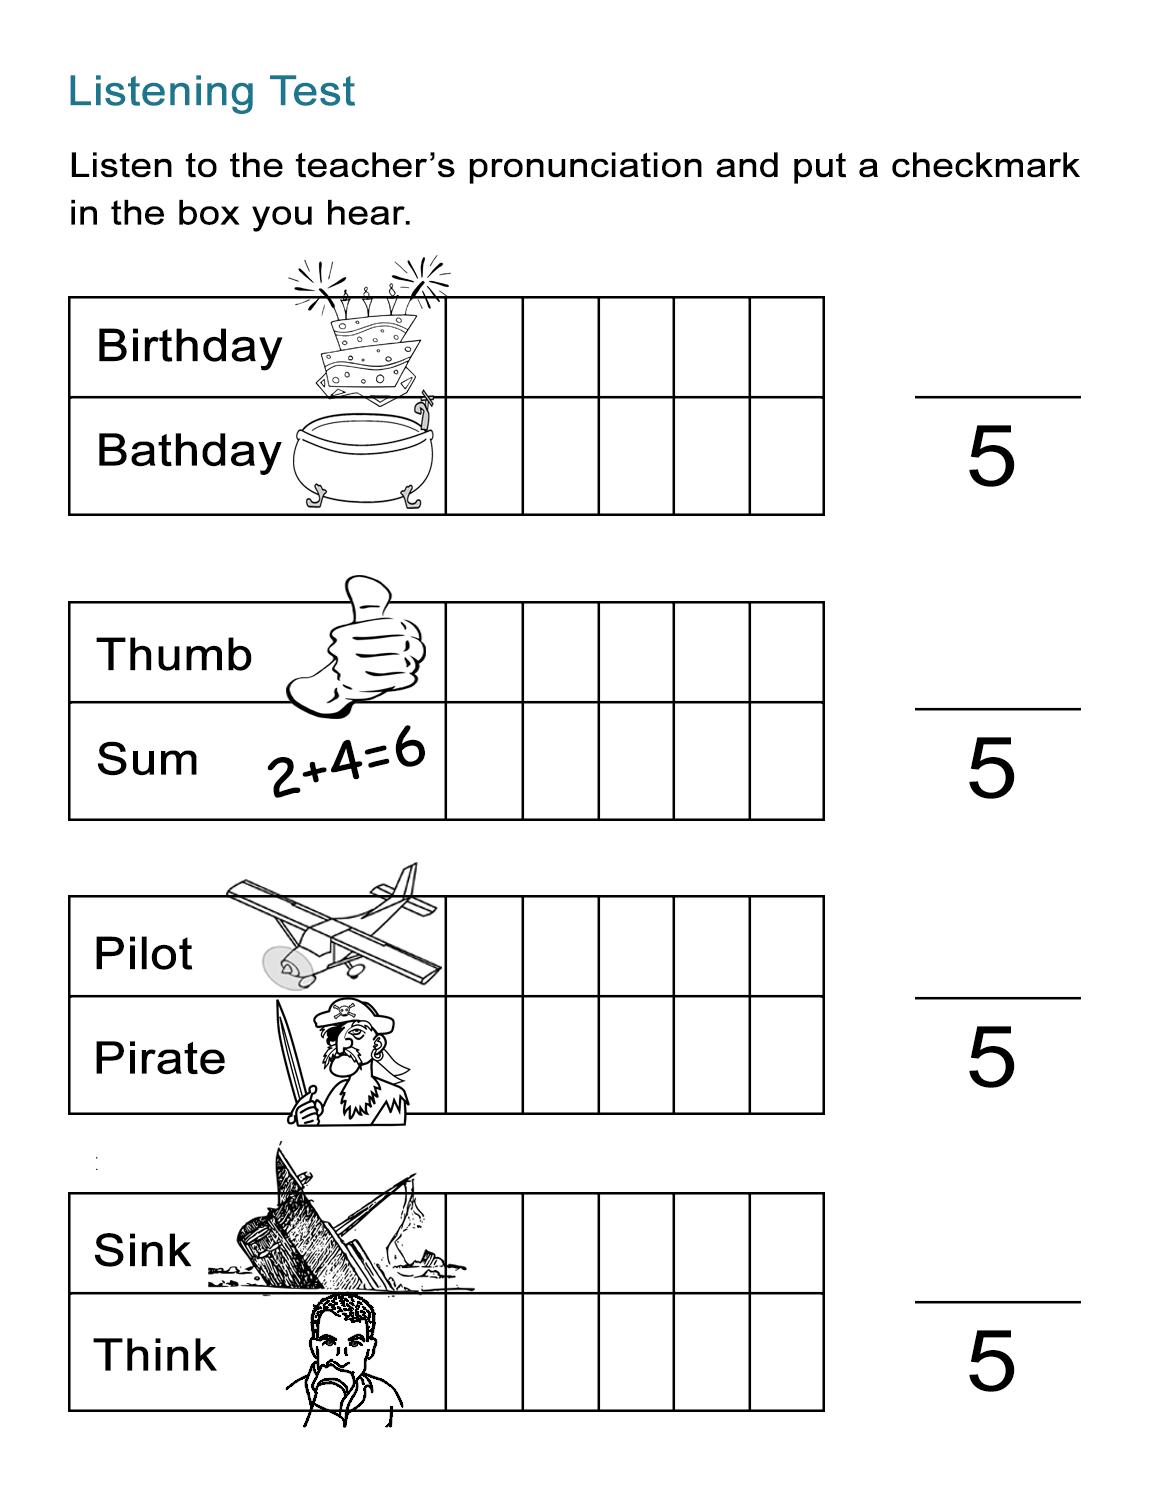 worksheet Pollution Worksheets 633151551243 multiplication worksheets ks1 air pollution picture composition writing worksheet excel free esl that enable english language learners all linear equations worksheet